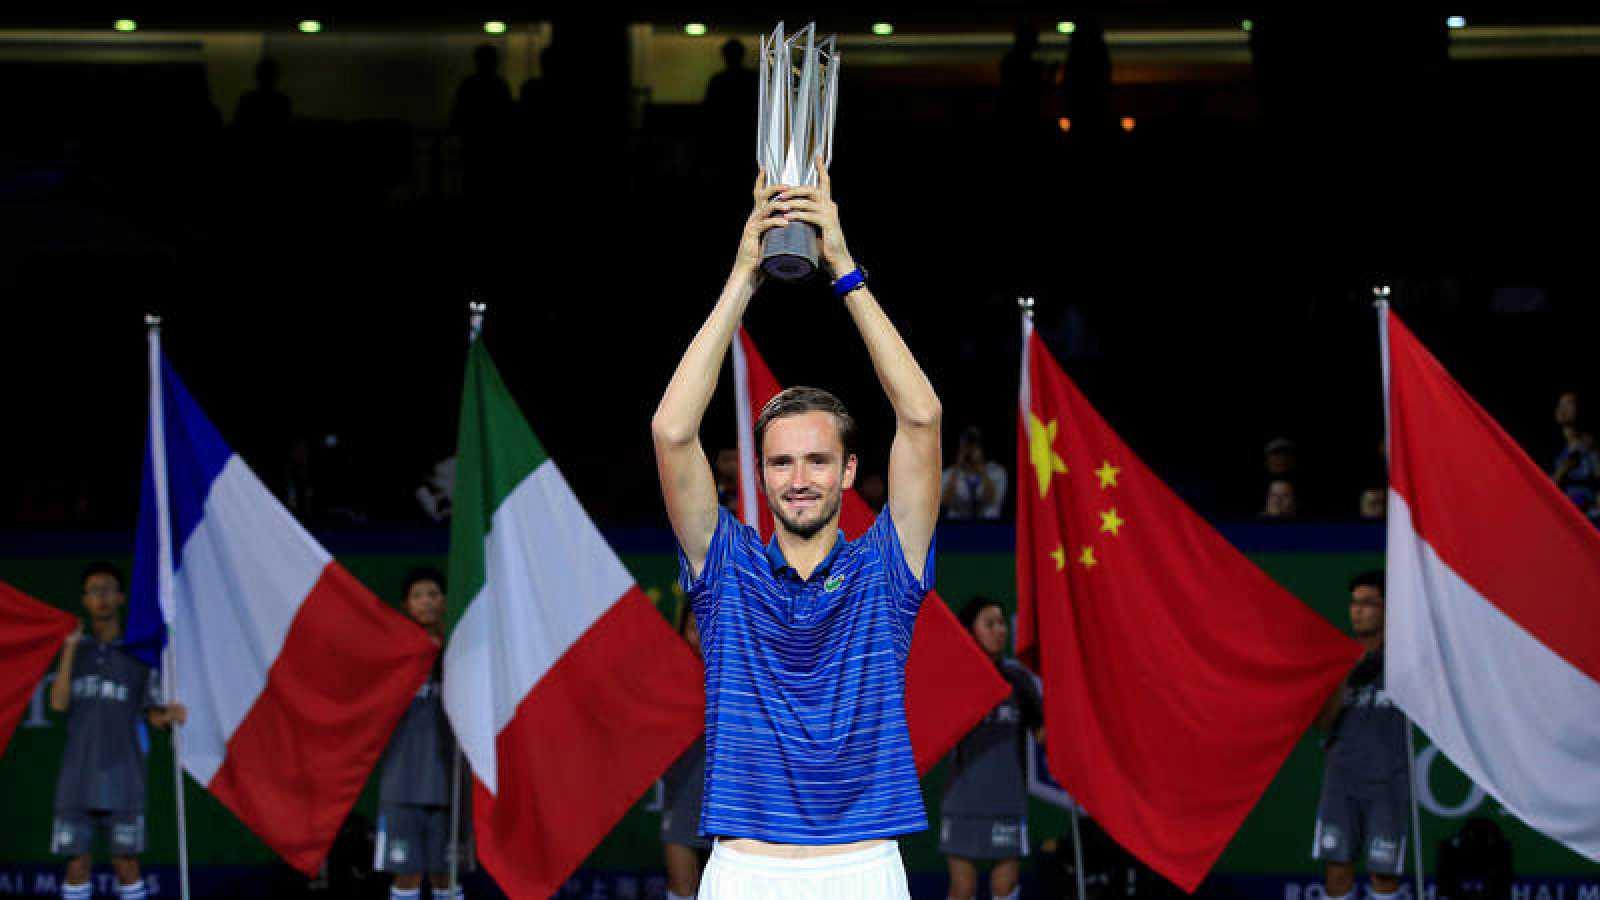 Daniil Medvedev supera a Federer y se coloca Nº3 de la ATP tras vencer en Shanghai